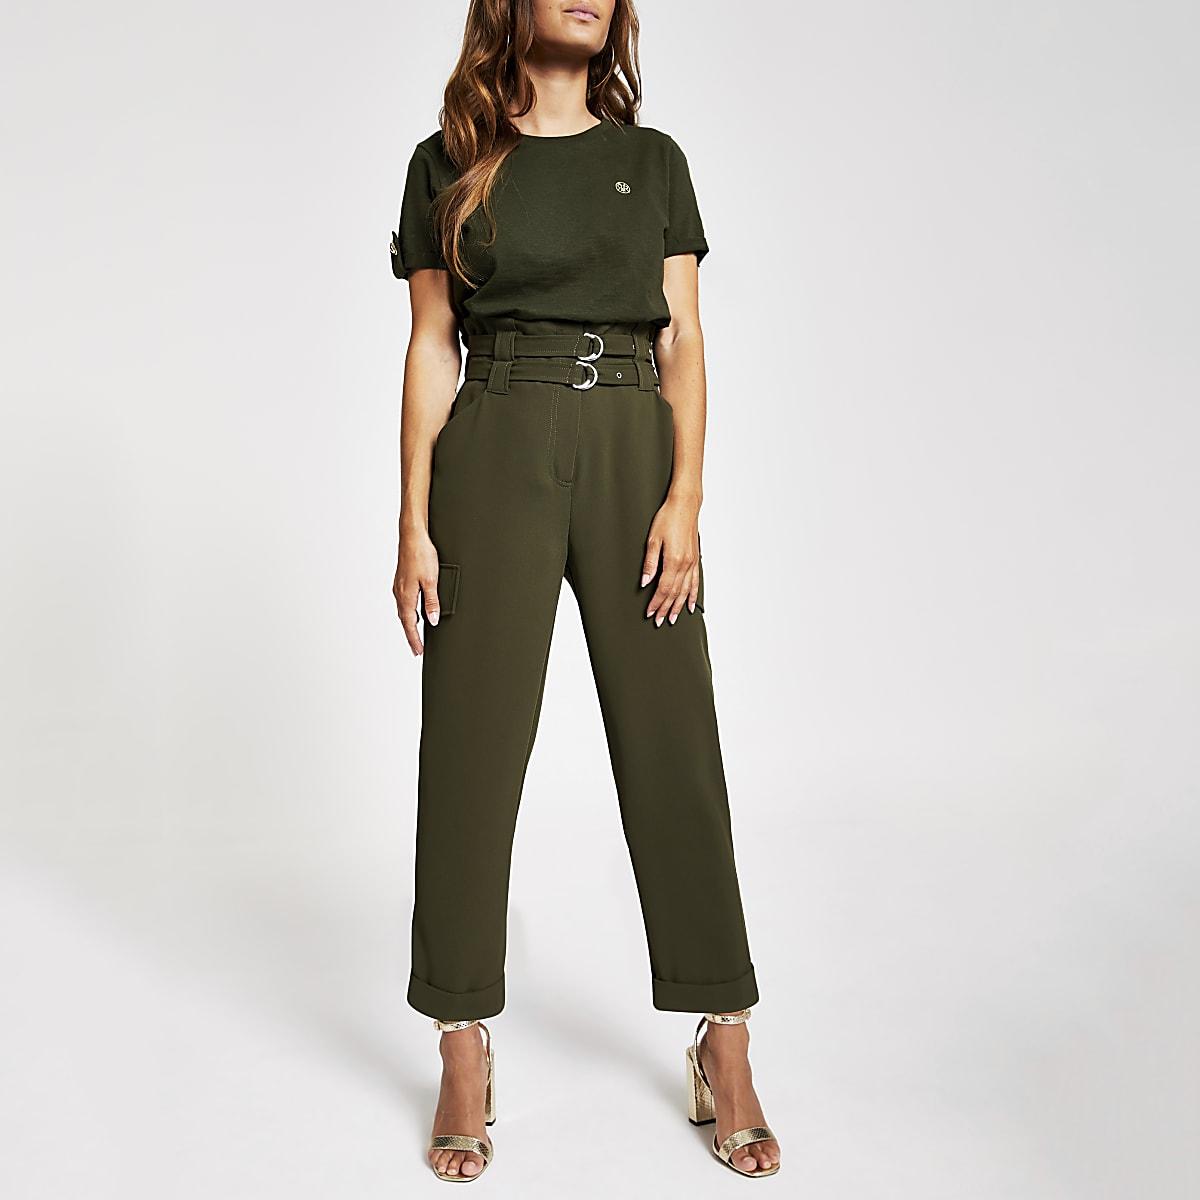 Petite khaki utility trousers